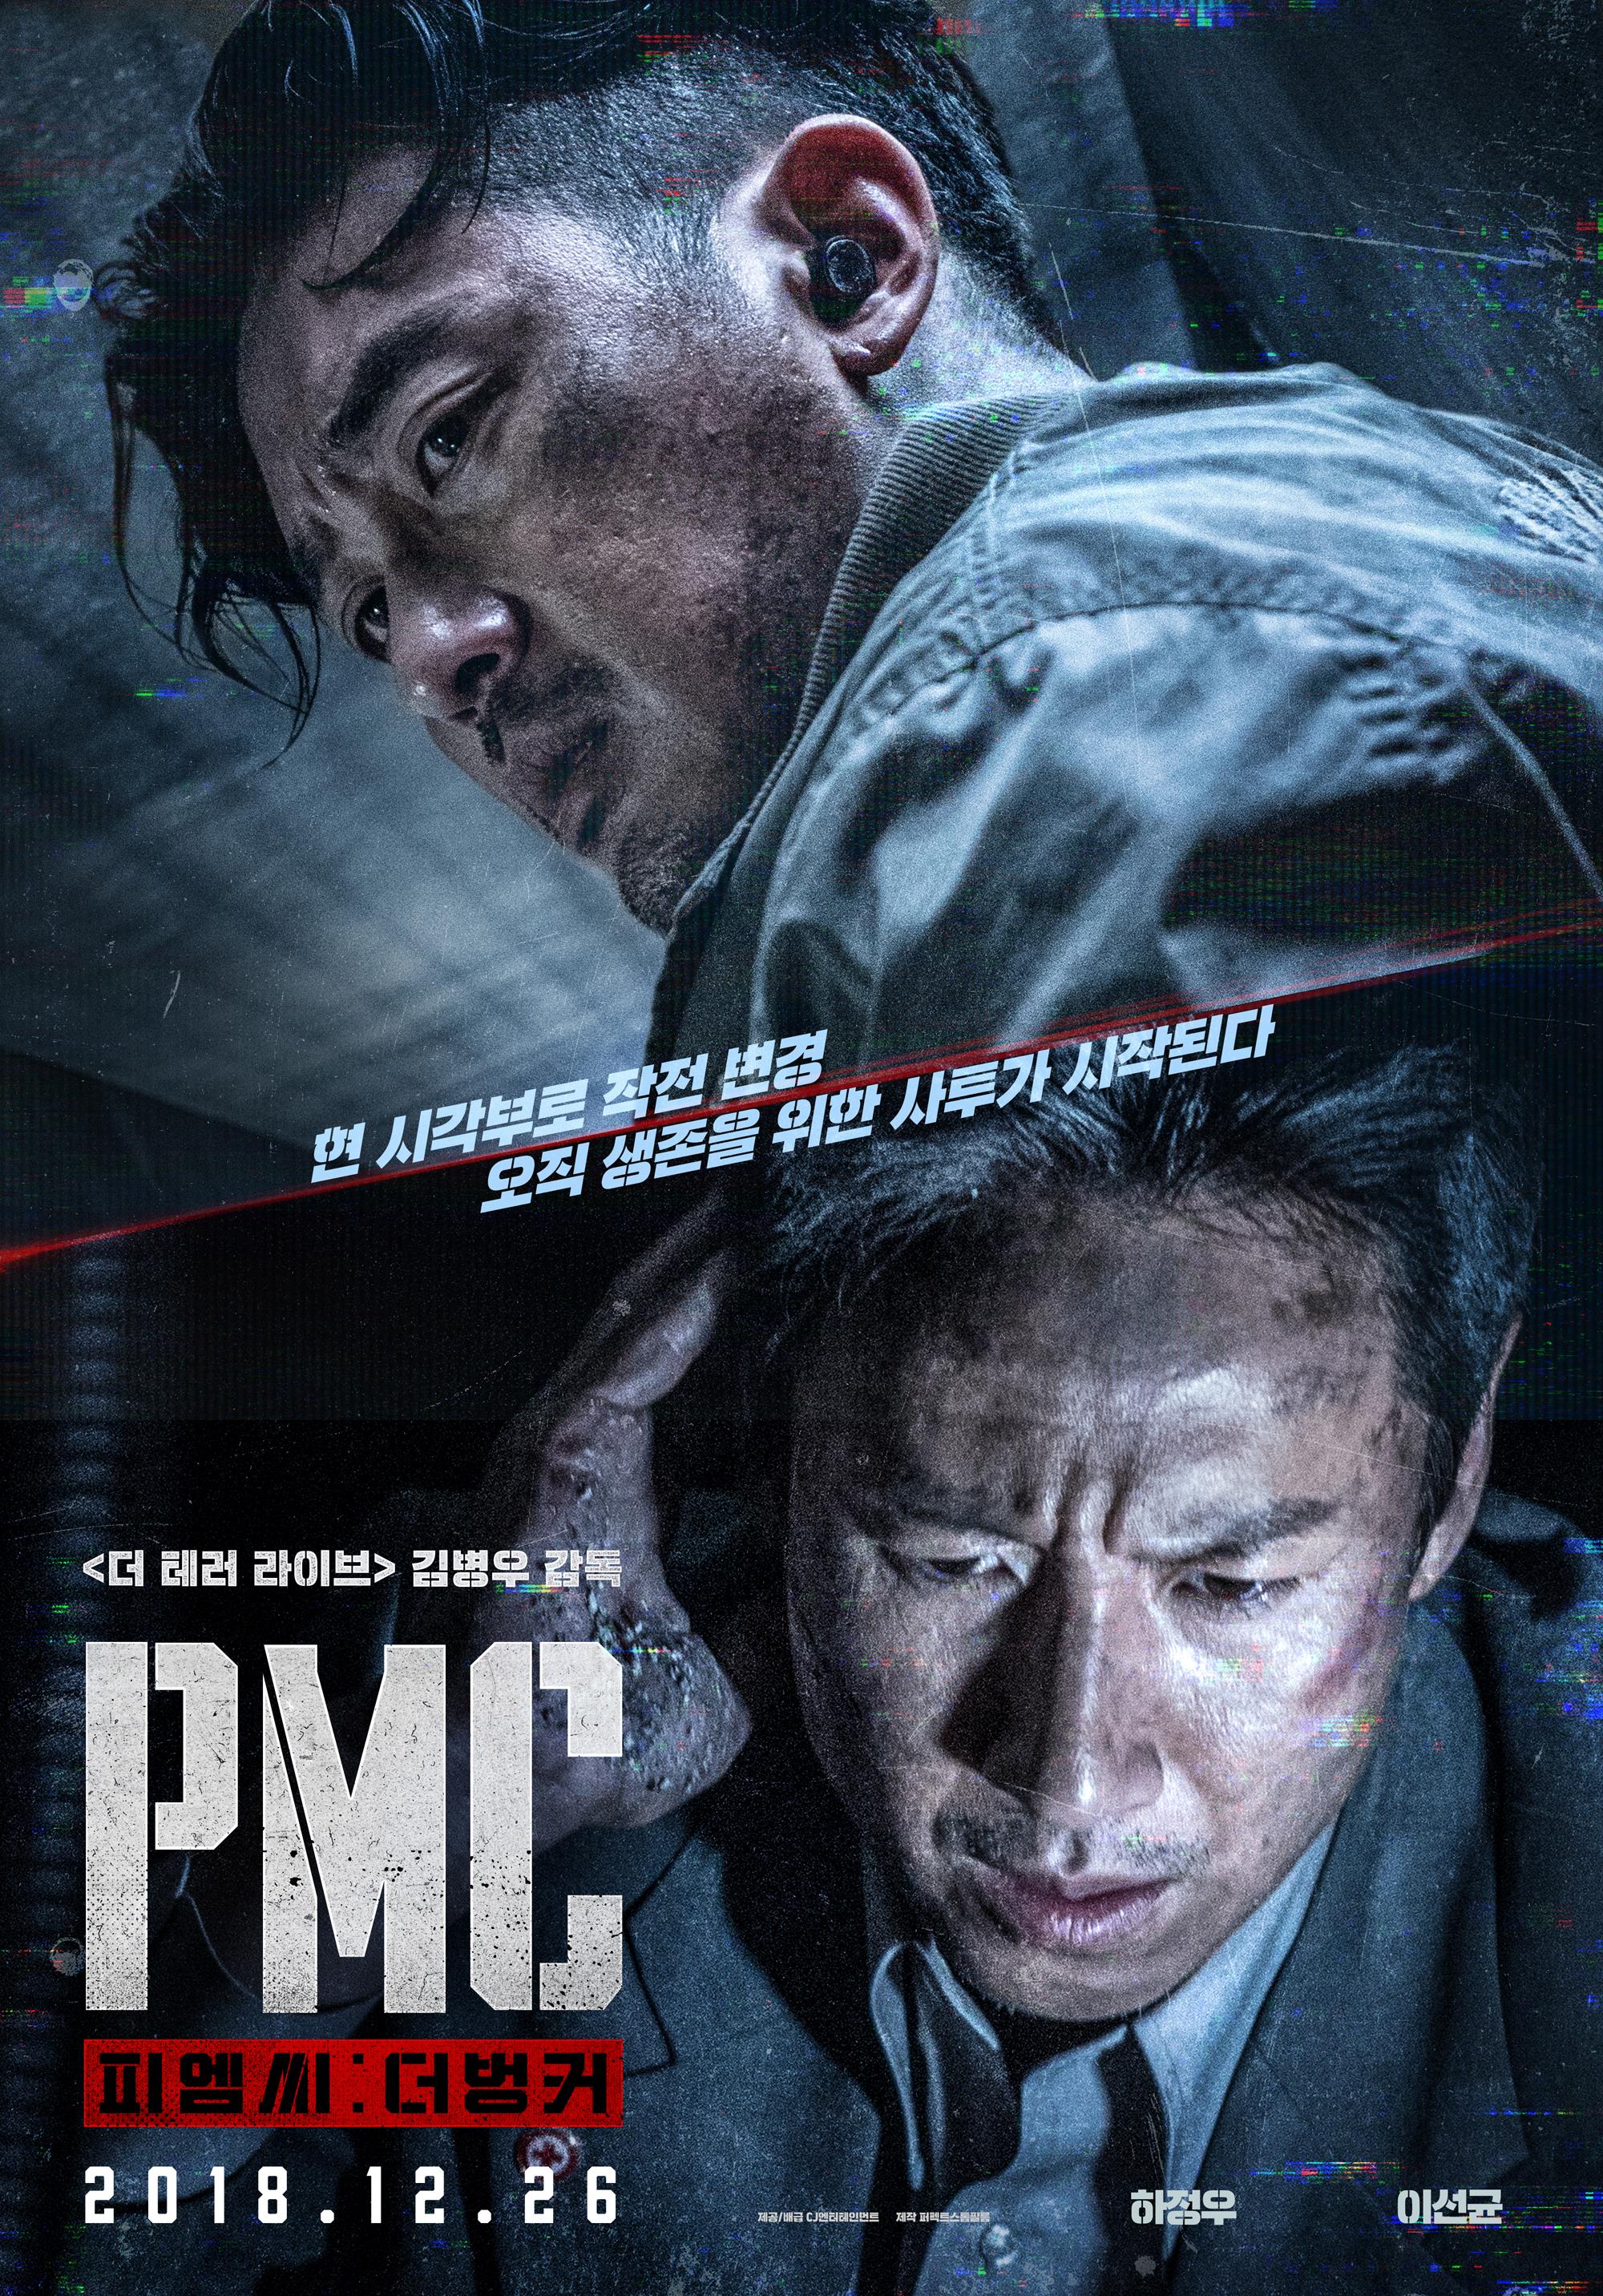 PMC: 더벙커